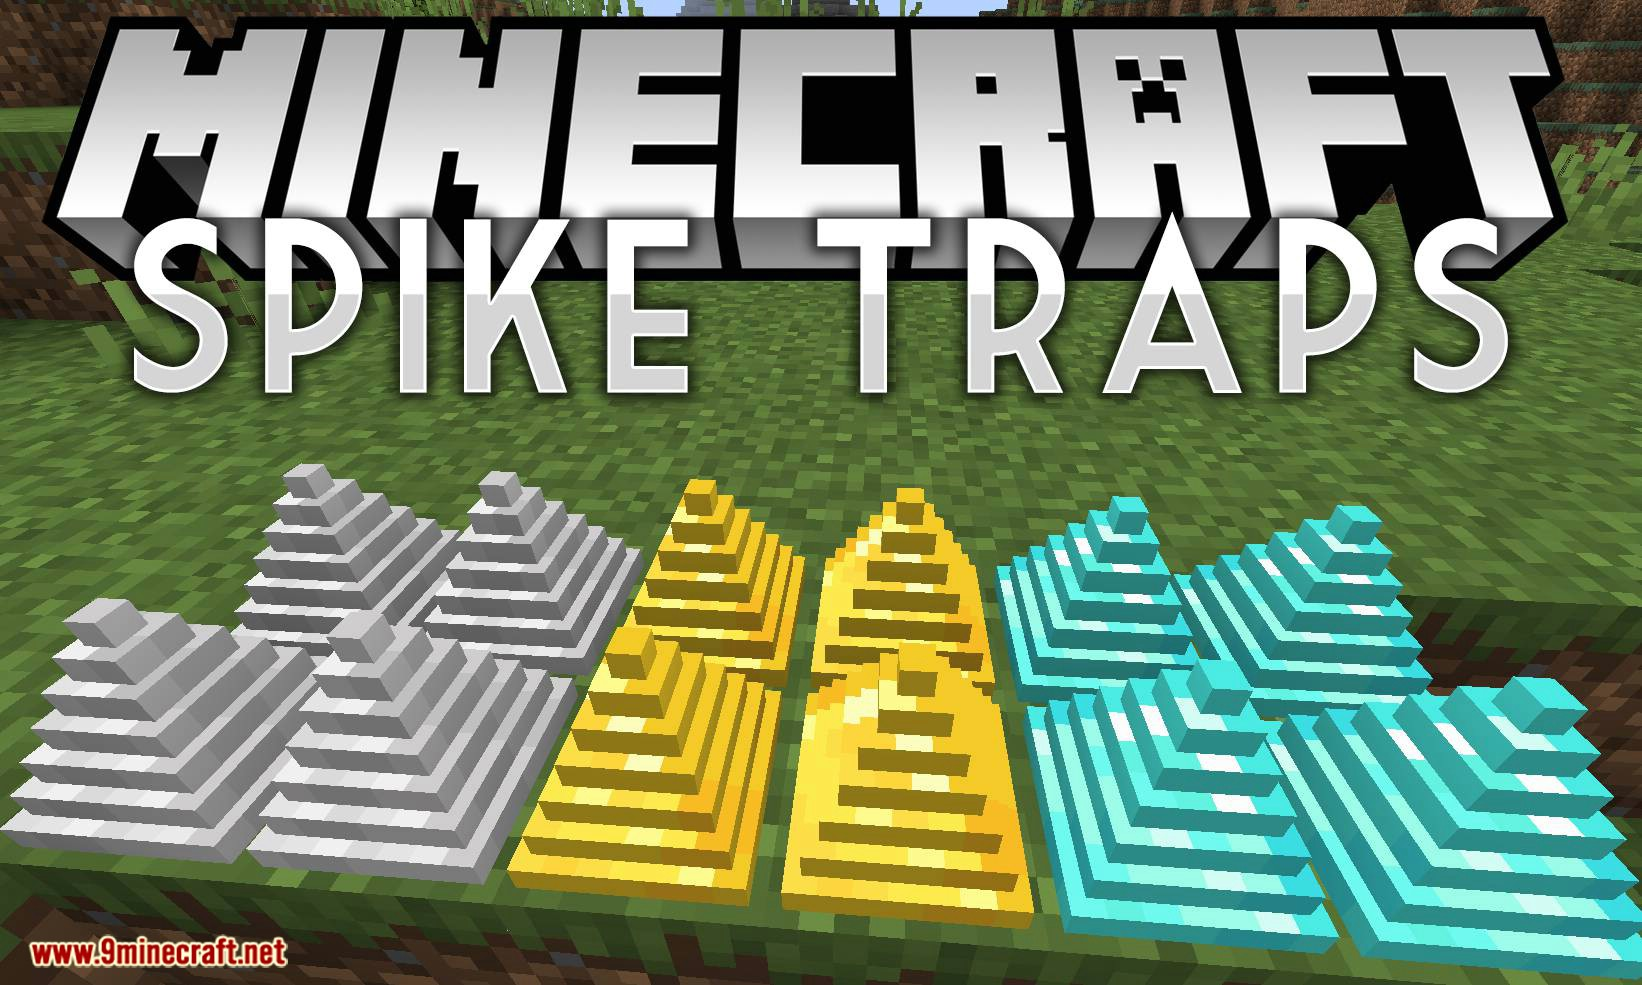 Spike Traps mod for minecraft logo